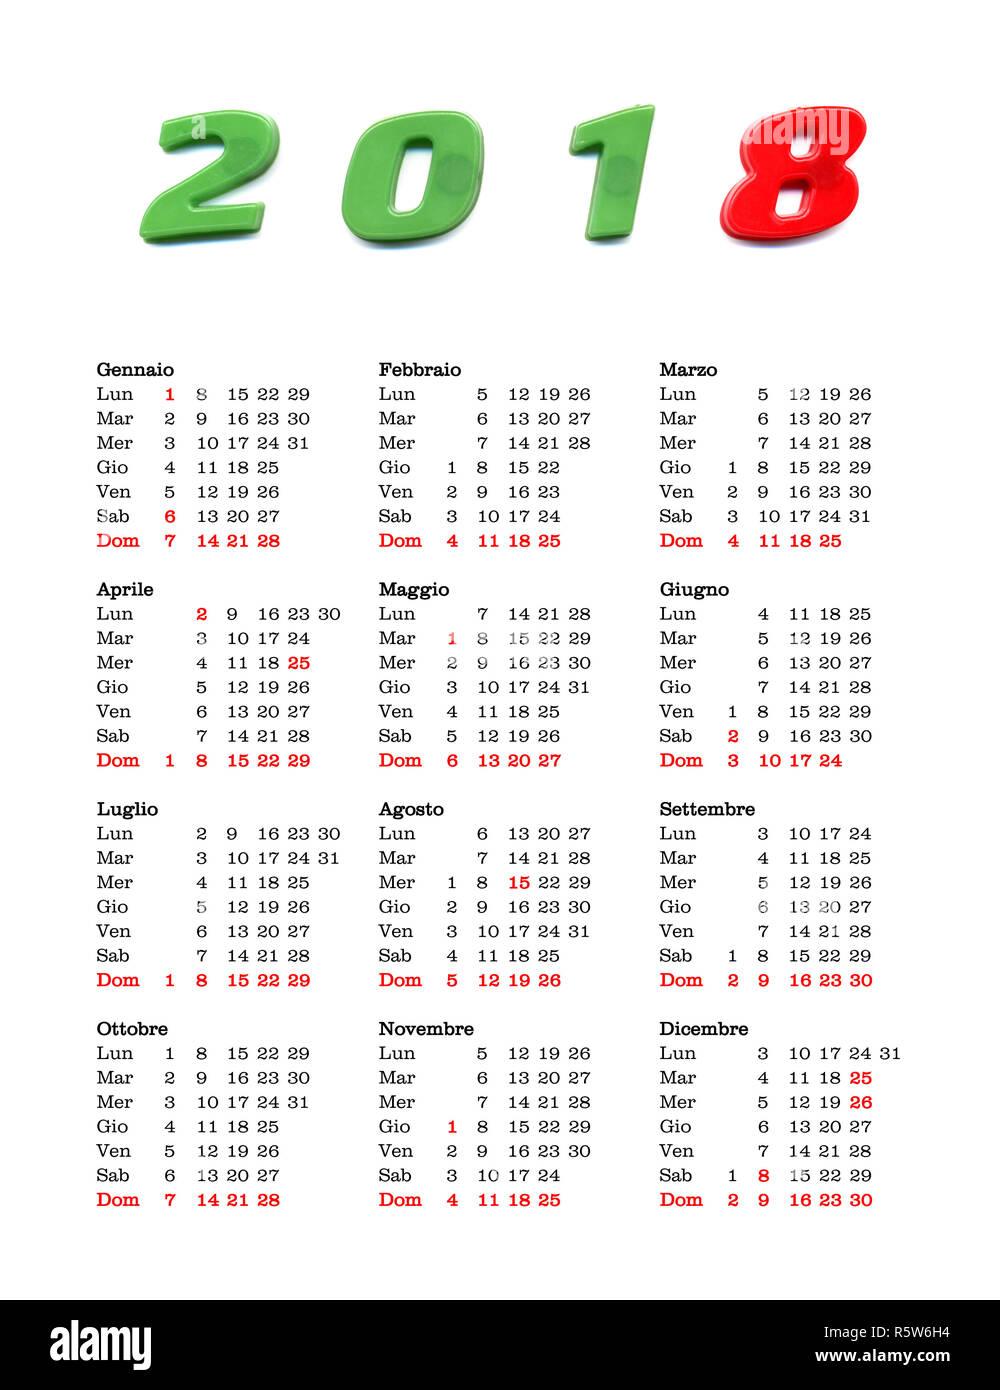 Italia Calendario.Anno 2018 Calendario Italia Foto Immagine Stock